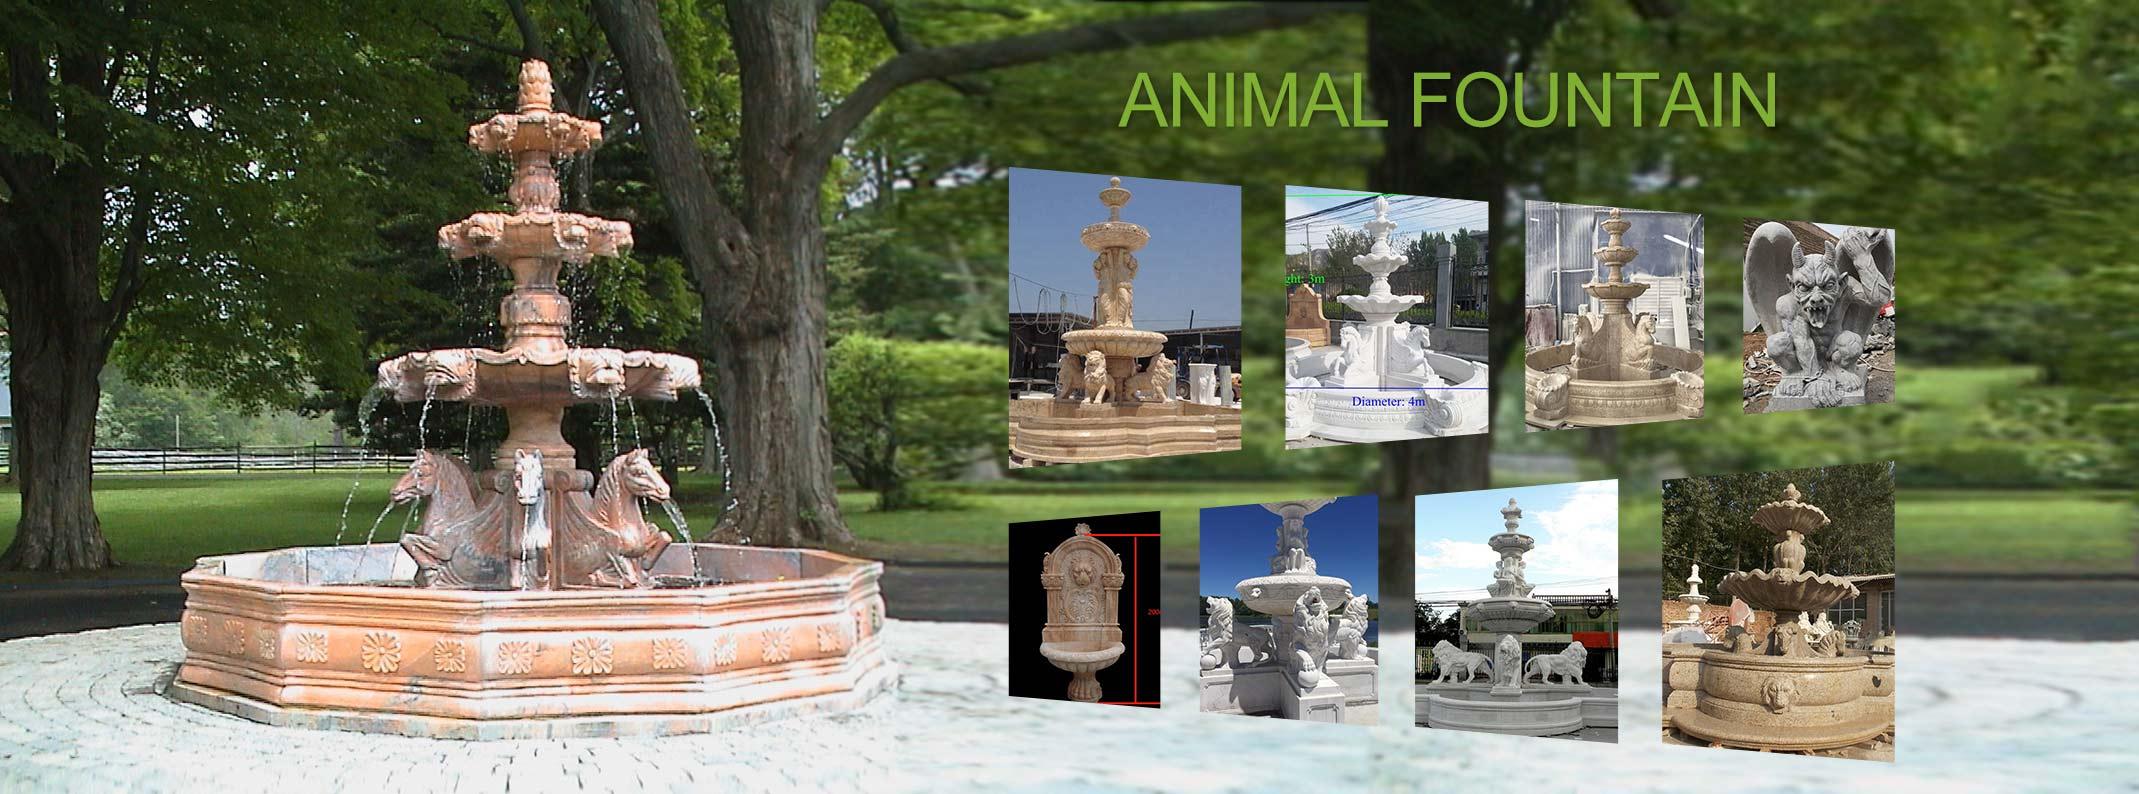 animal fountain